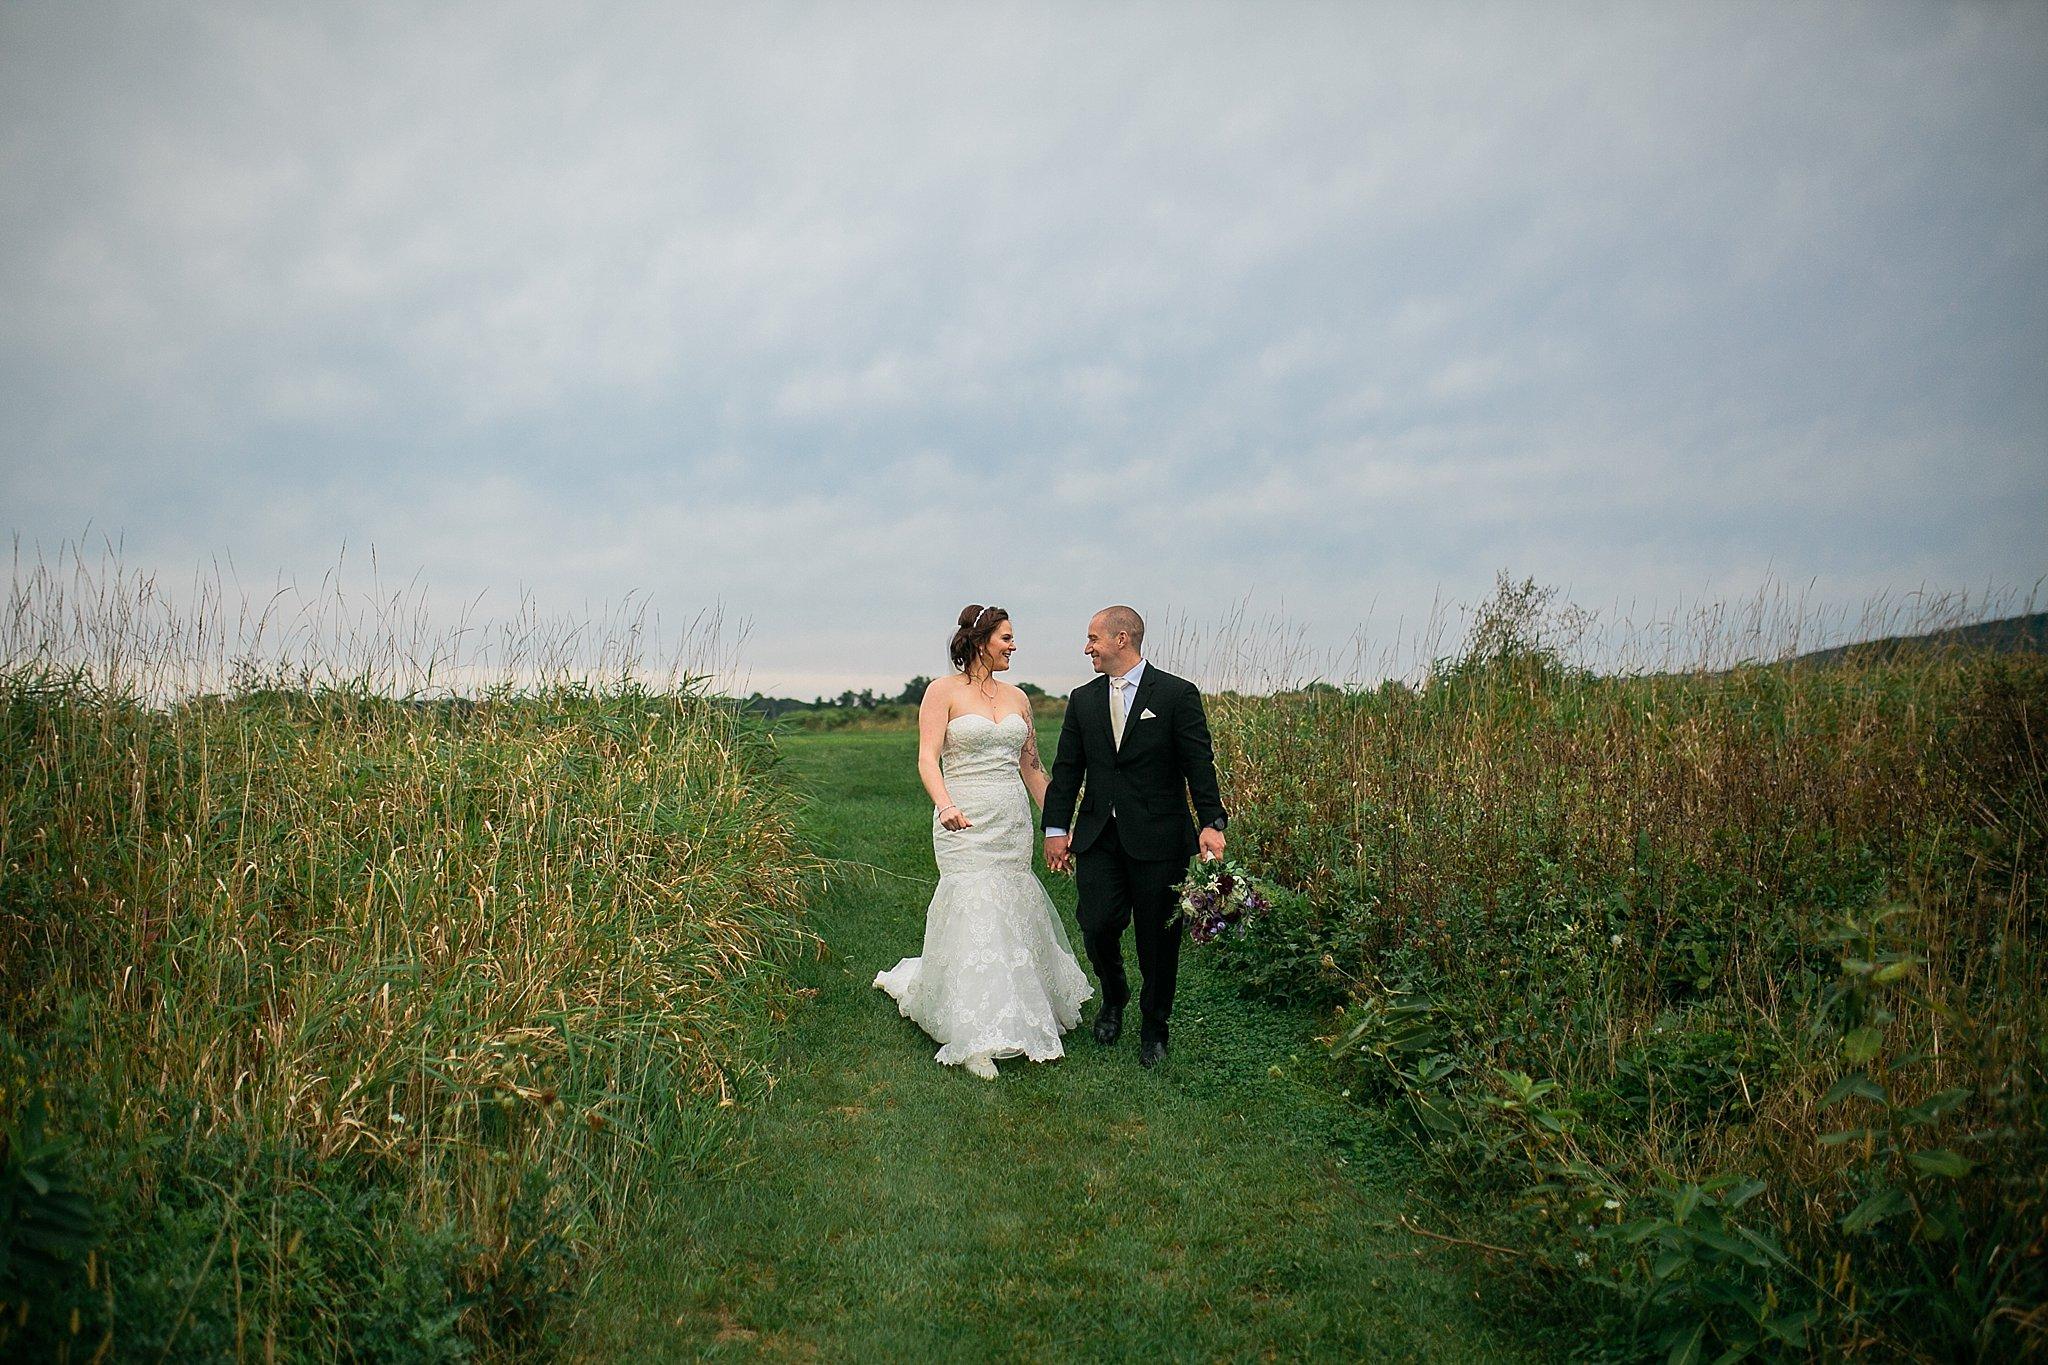 Links at Unionvale Wedding Lagrangeville Wedding Hudson Valley Wedding Photographer Sweet Alice Photography59.jpg